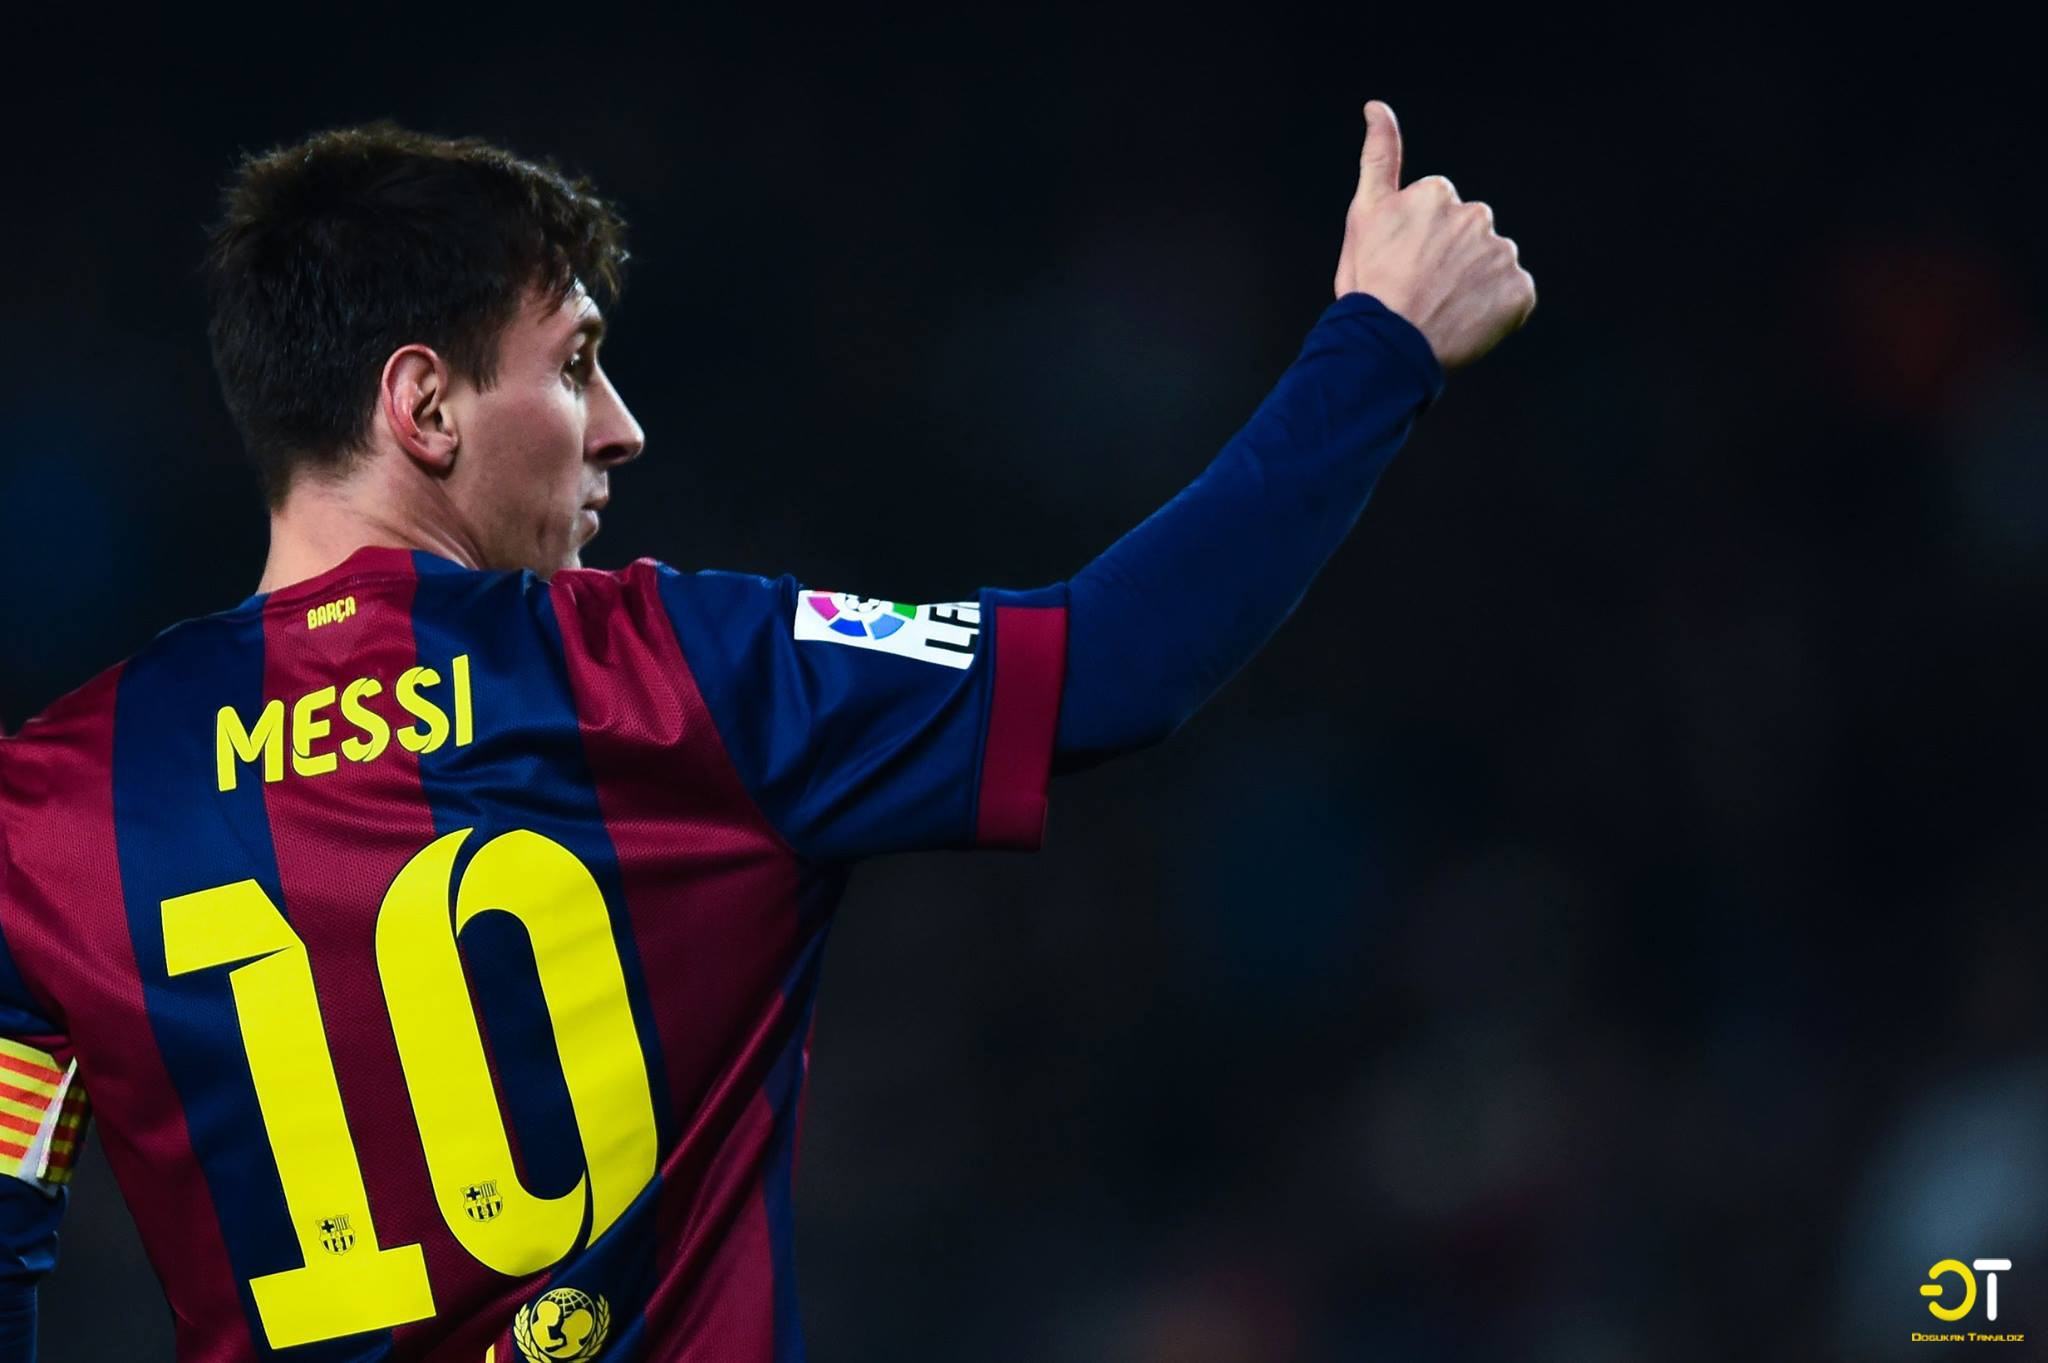 People 2048x1363 Lionel Messi FC Barcelona men sport  sports hand gesture soccer numbers Luis Suarez Neymar